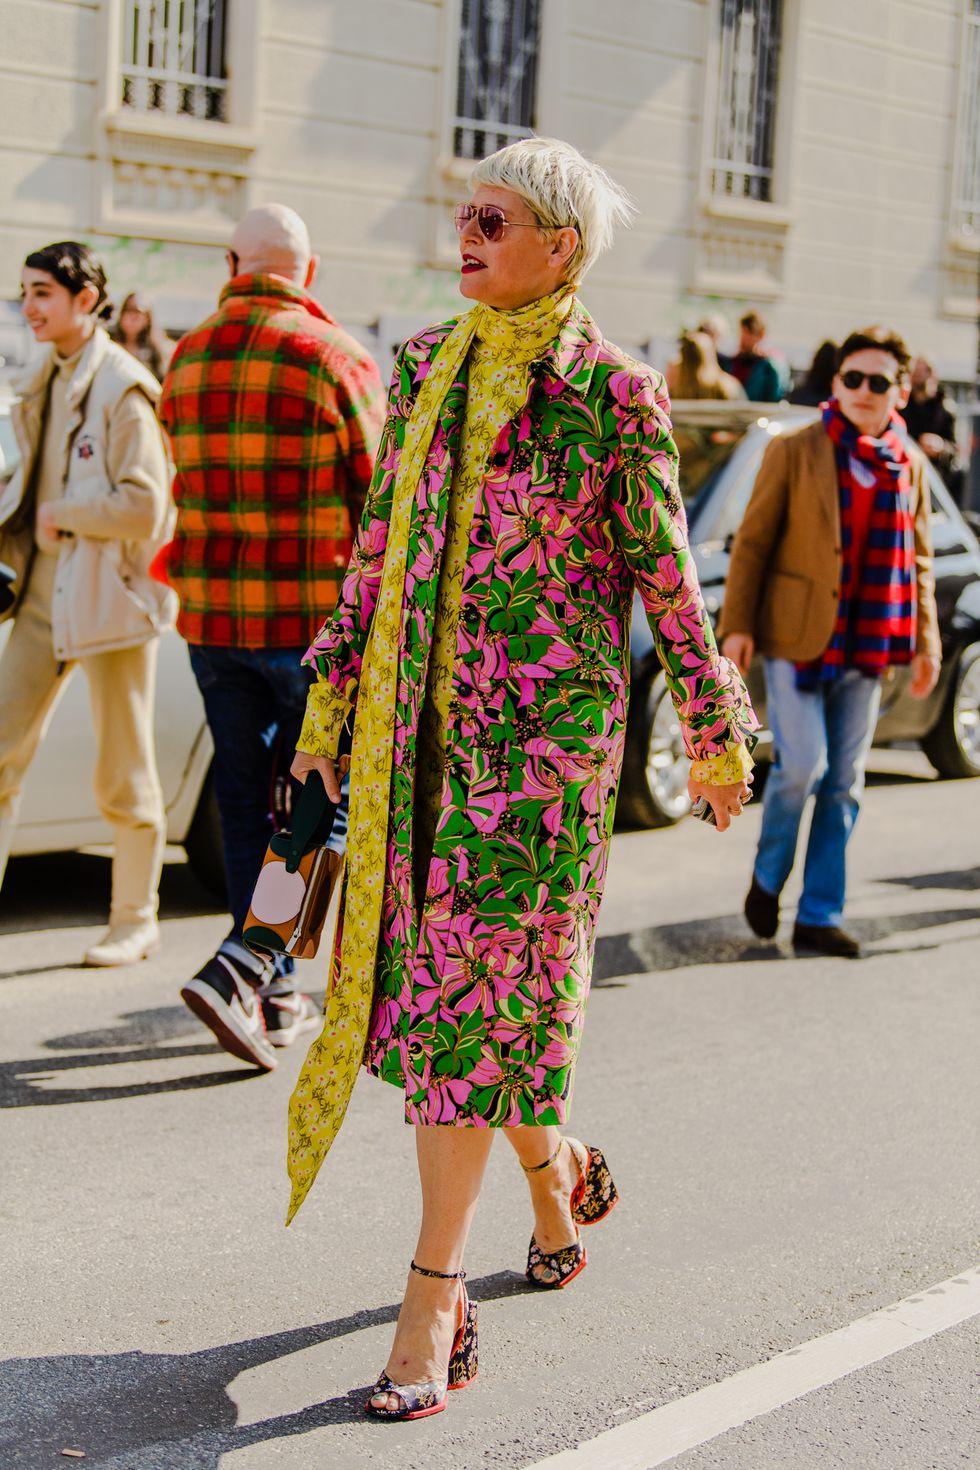 milan fashion week 2020 The Street Style Trends From Milan Fashion Week 2020 fw20 mfw milan street style tyler joe day 4 060 1582486417